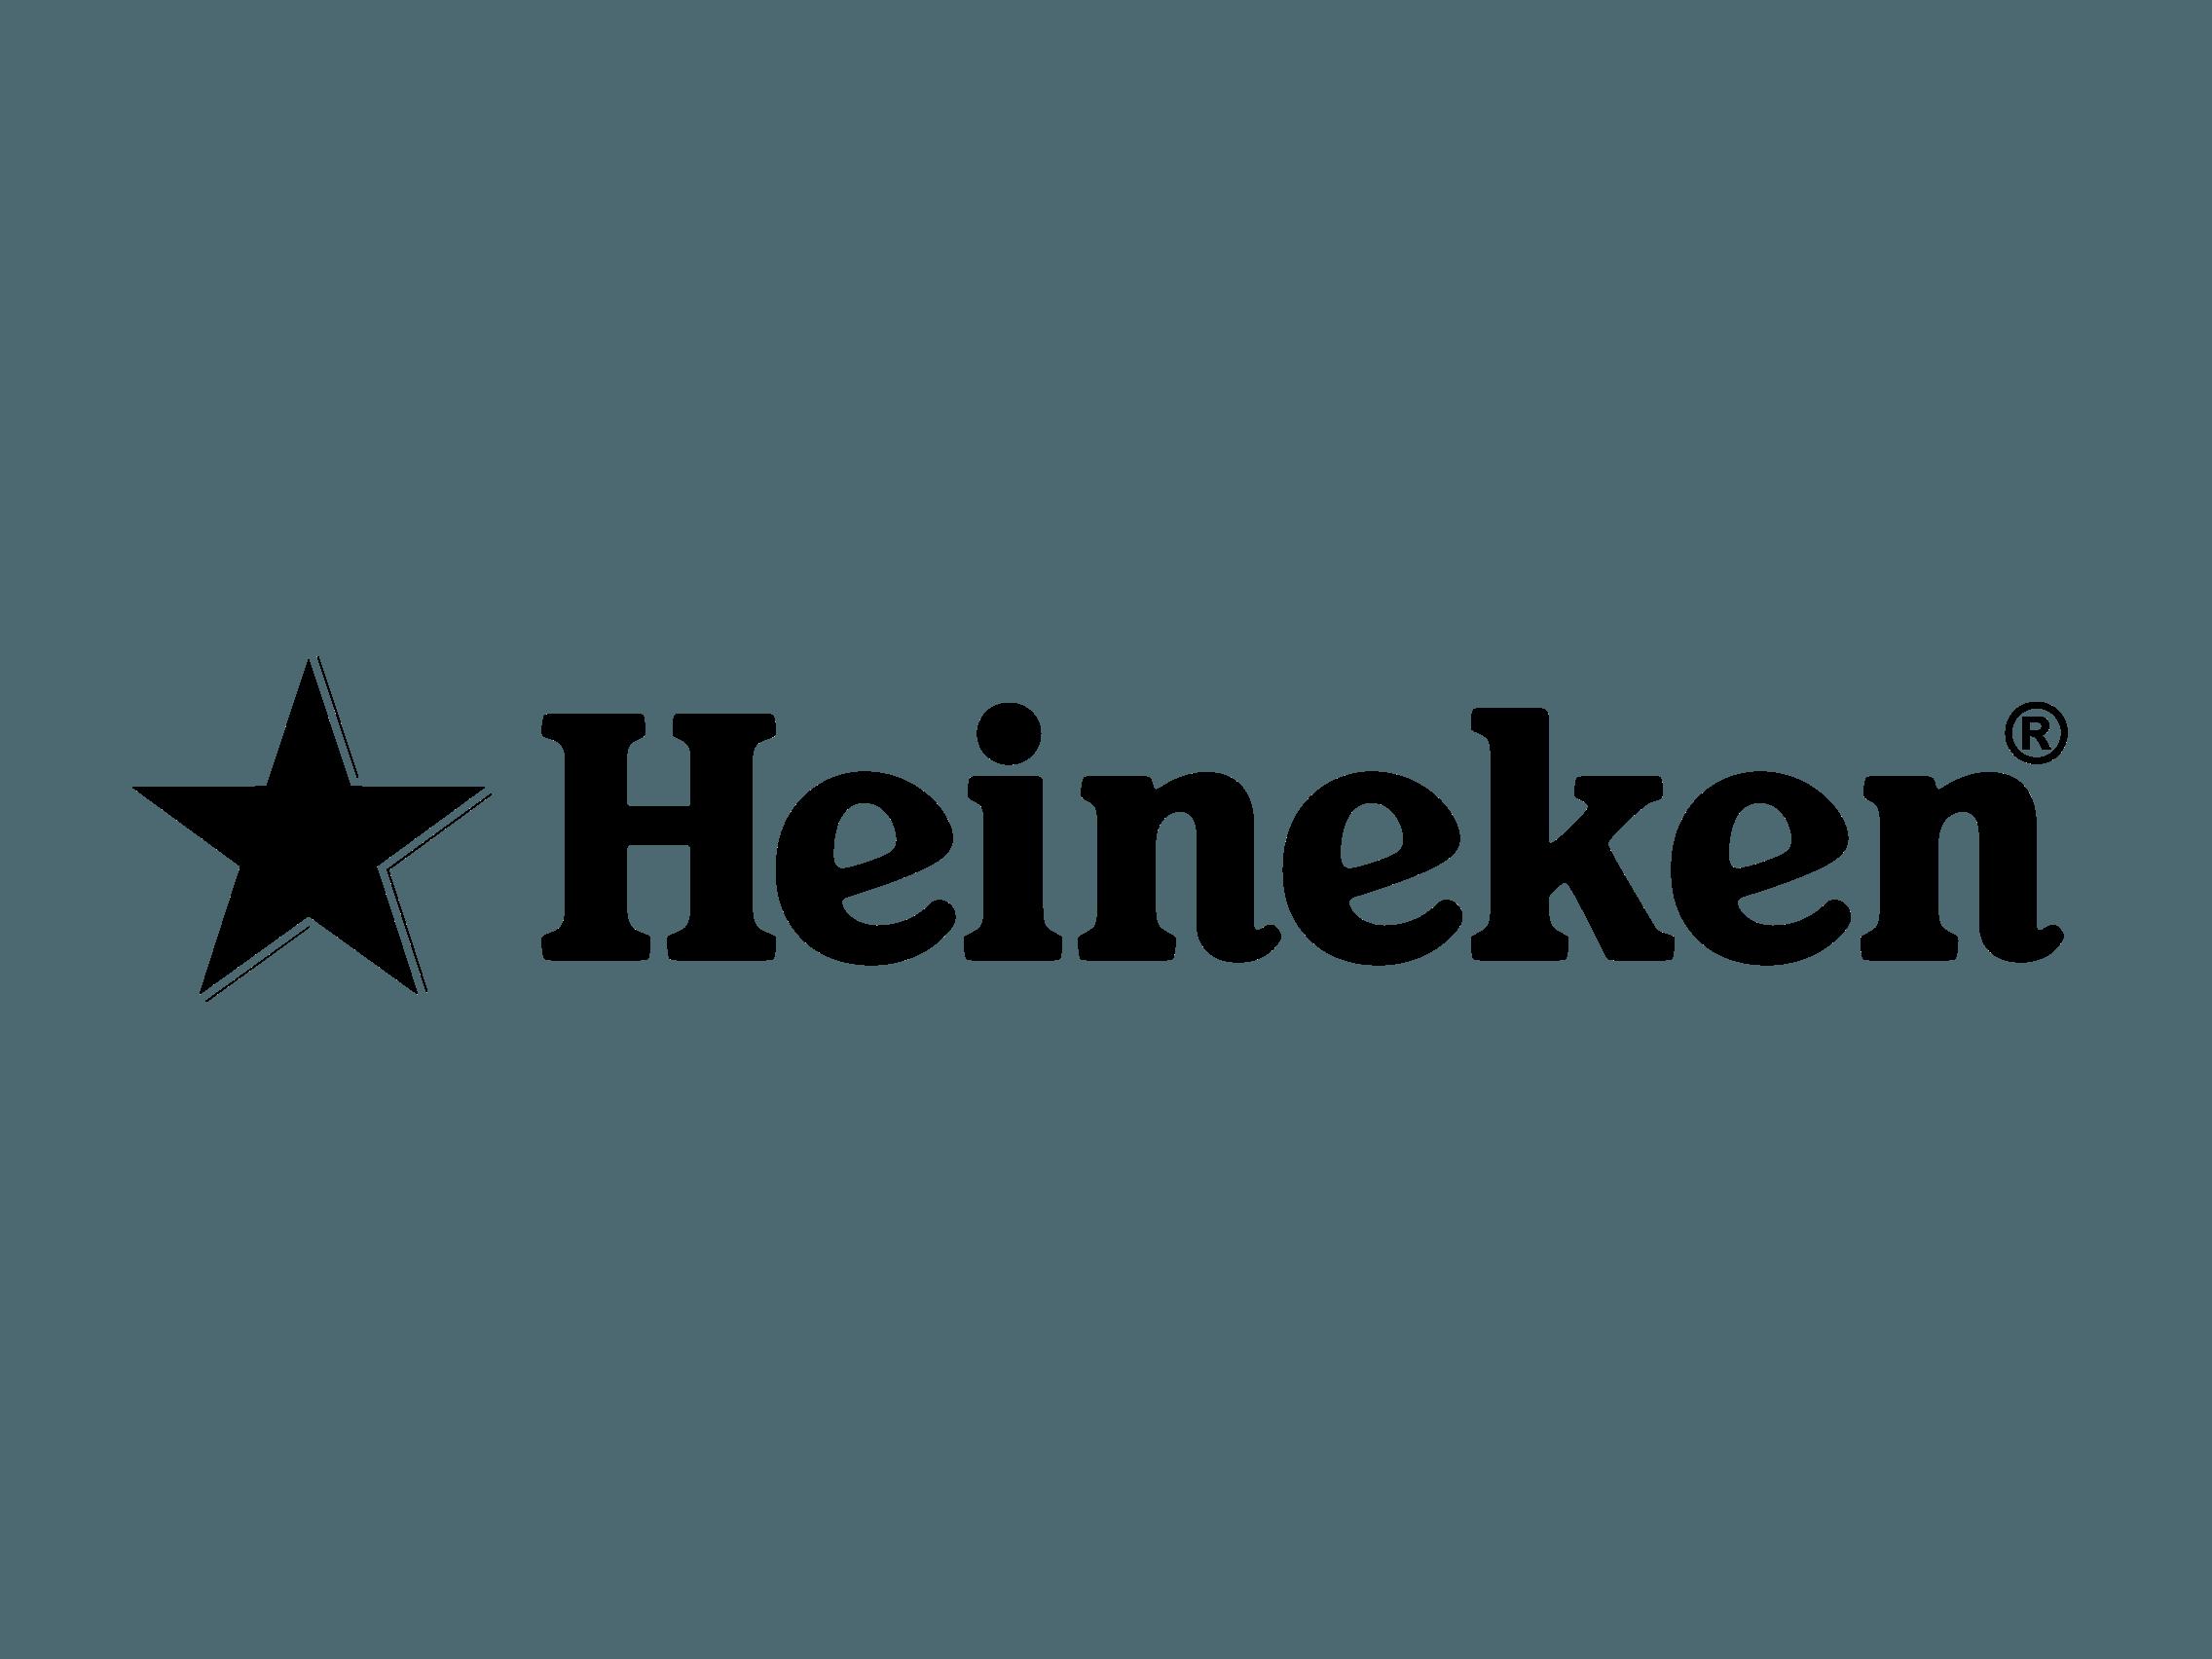 heineken-logo-png-cool-heineken-logo-png-81-on-design-a-logo-with-heineken-logo-png-2272.png